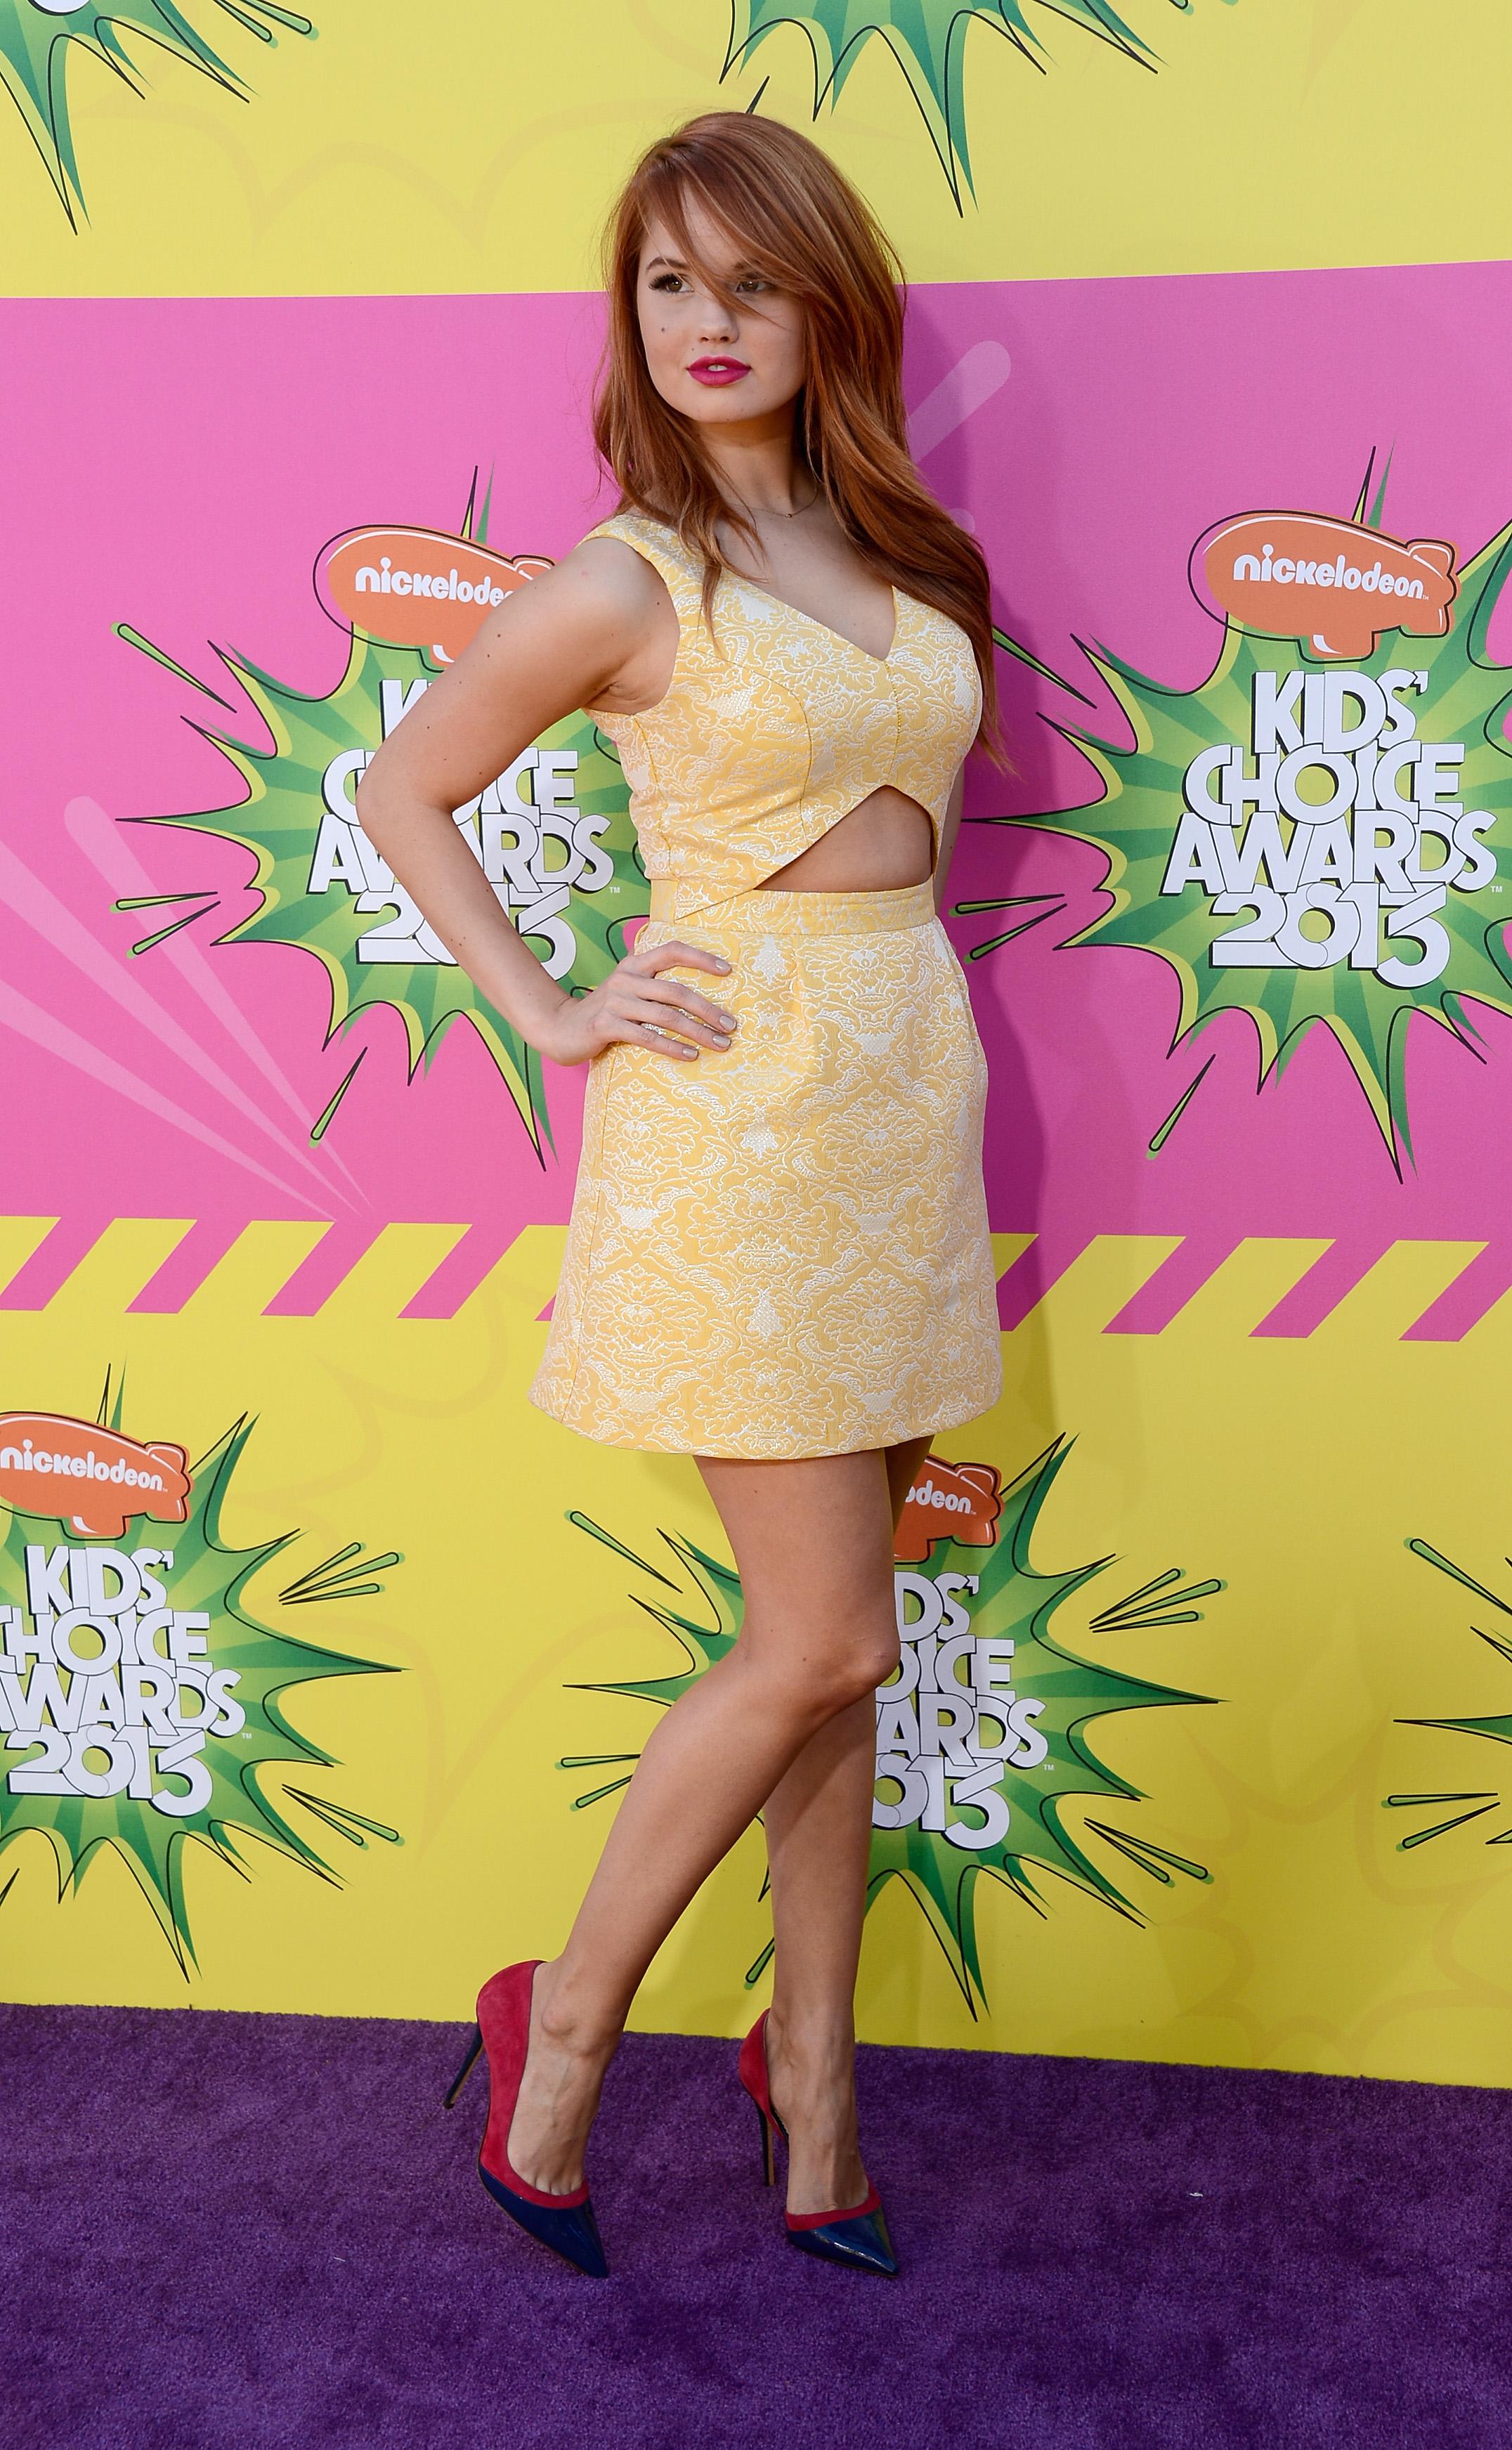 The Toe Cleavage Blog: Former Teen Stars